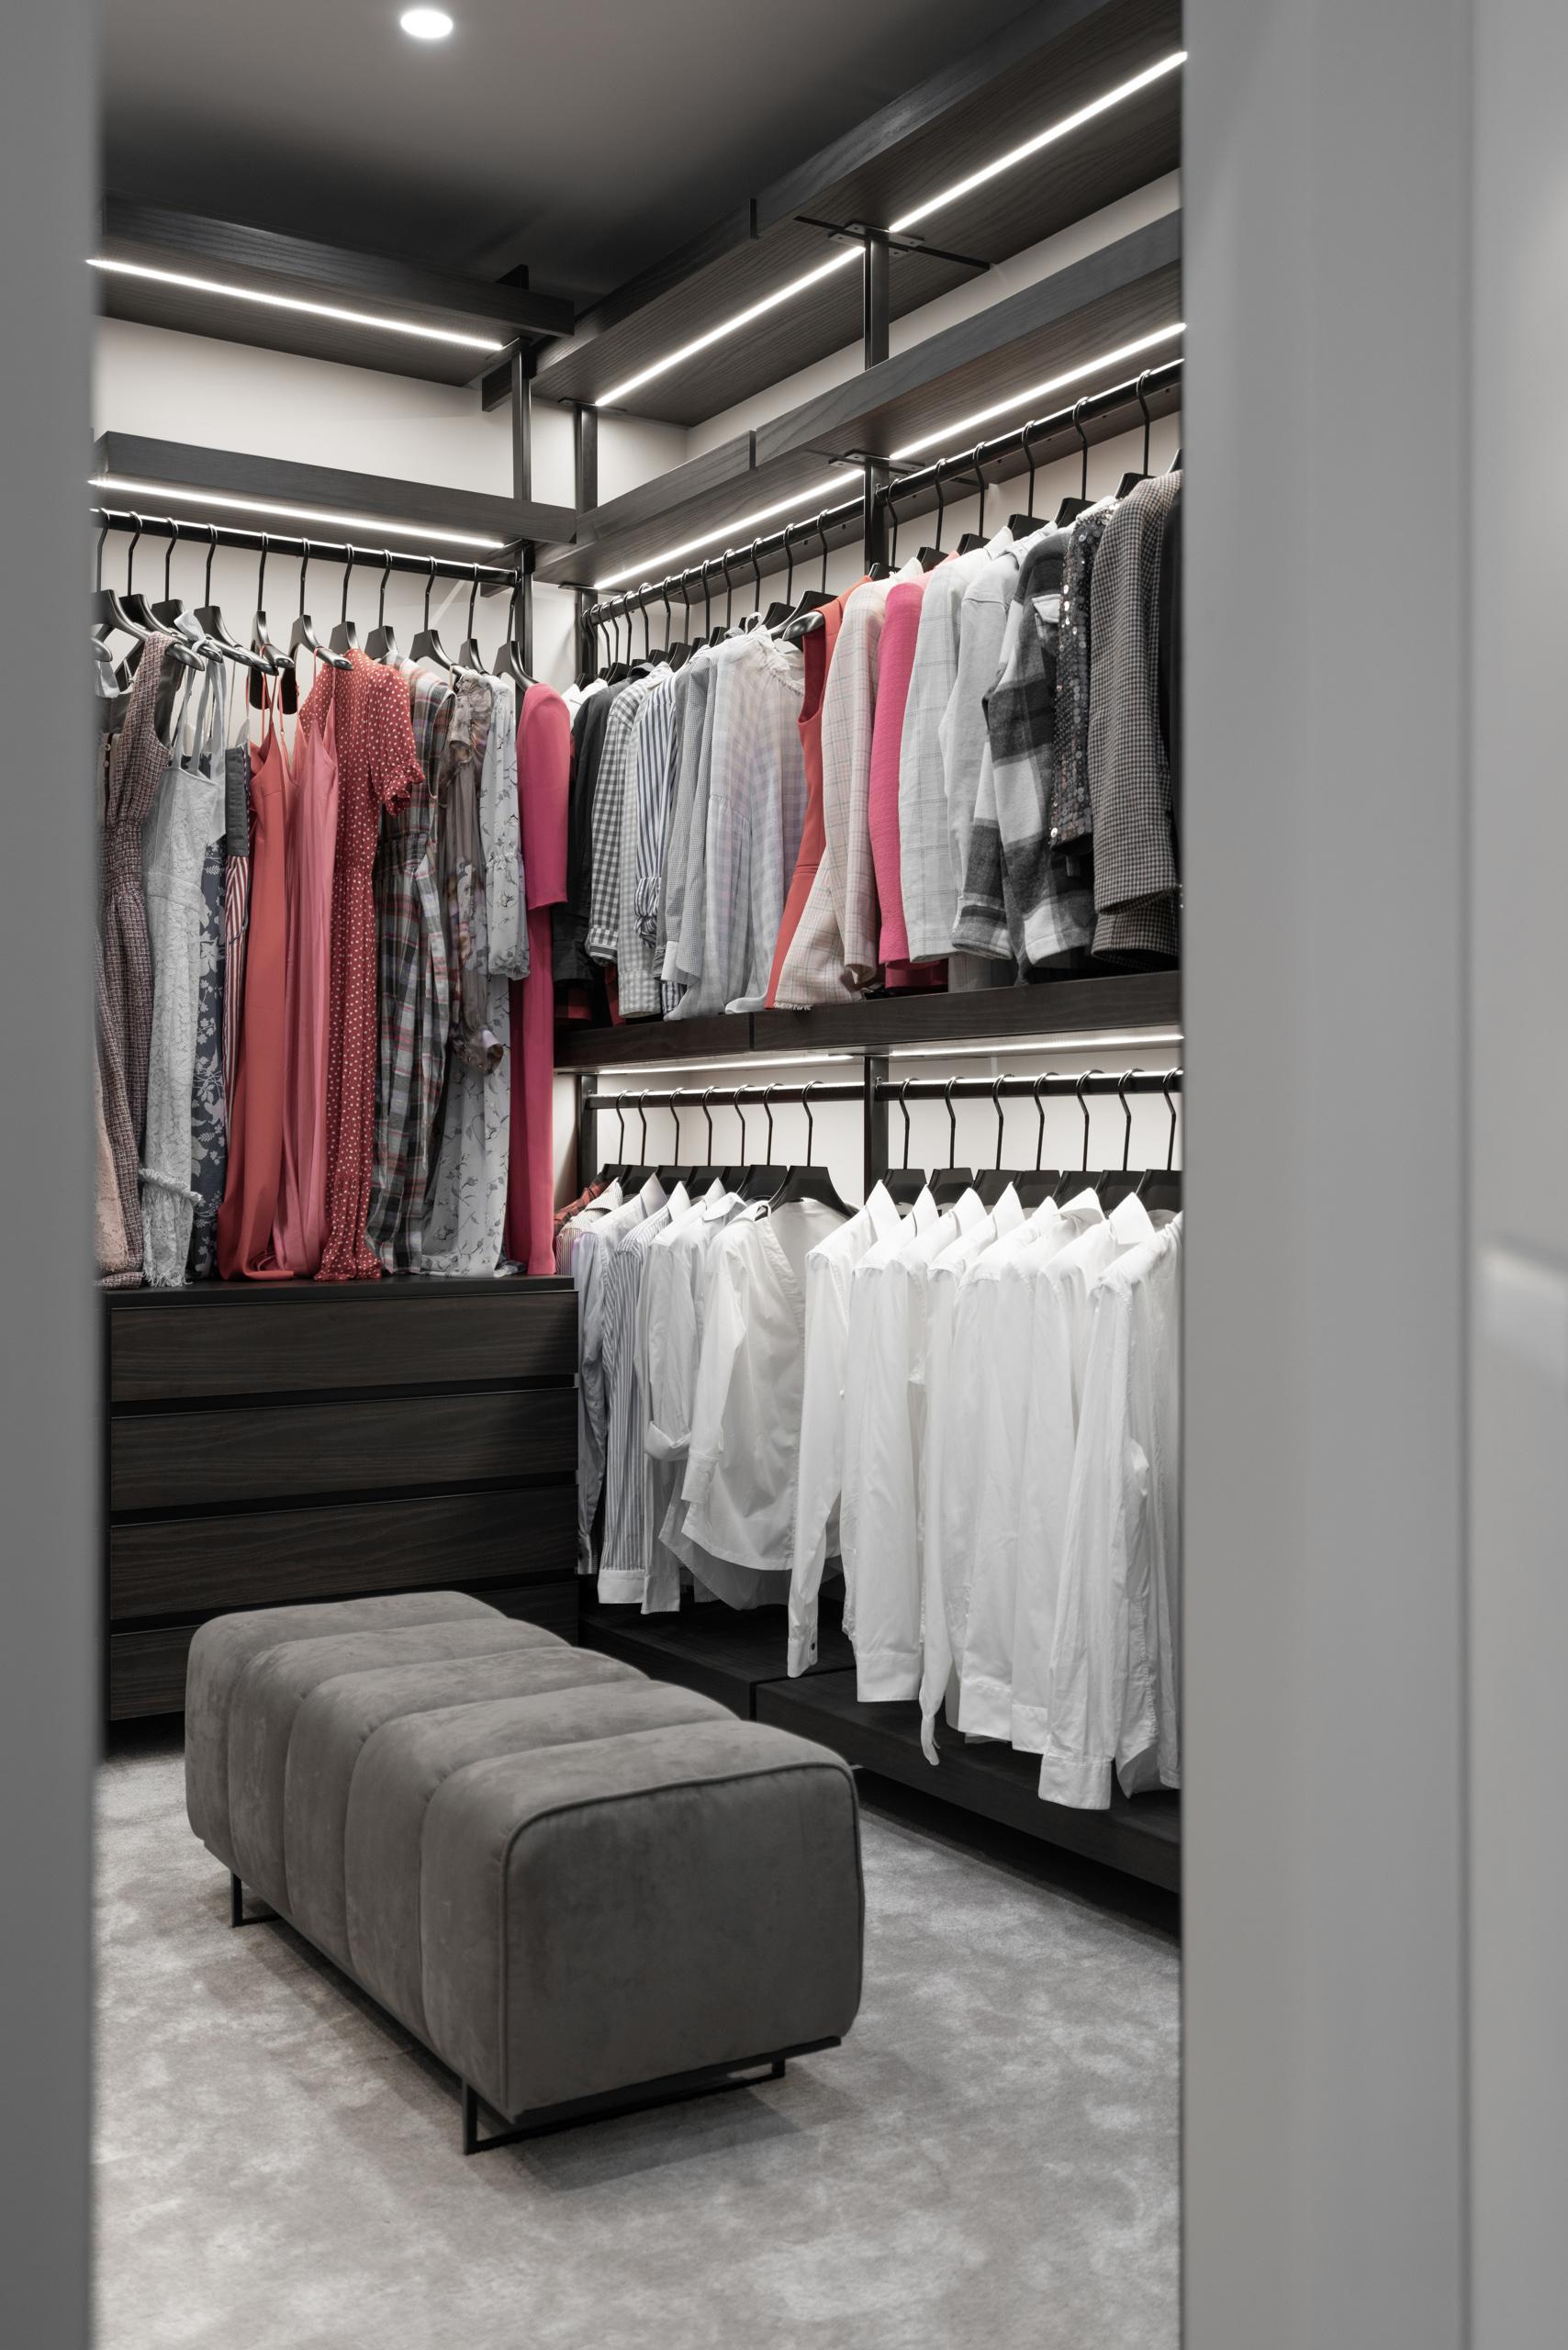 Фотосъемка интерьера гардероба в квартире